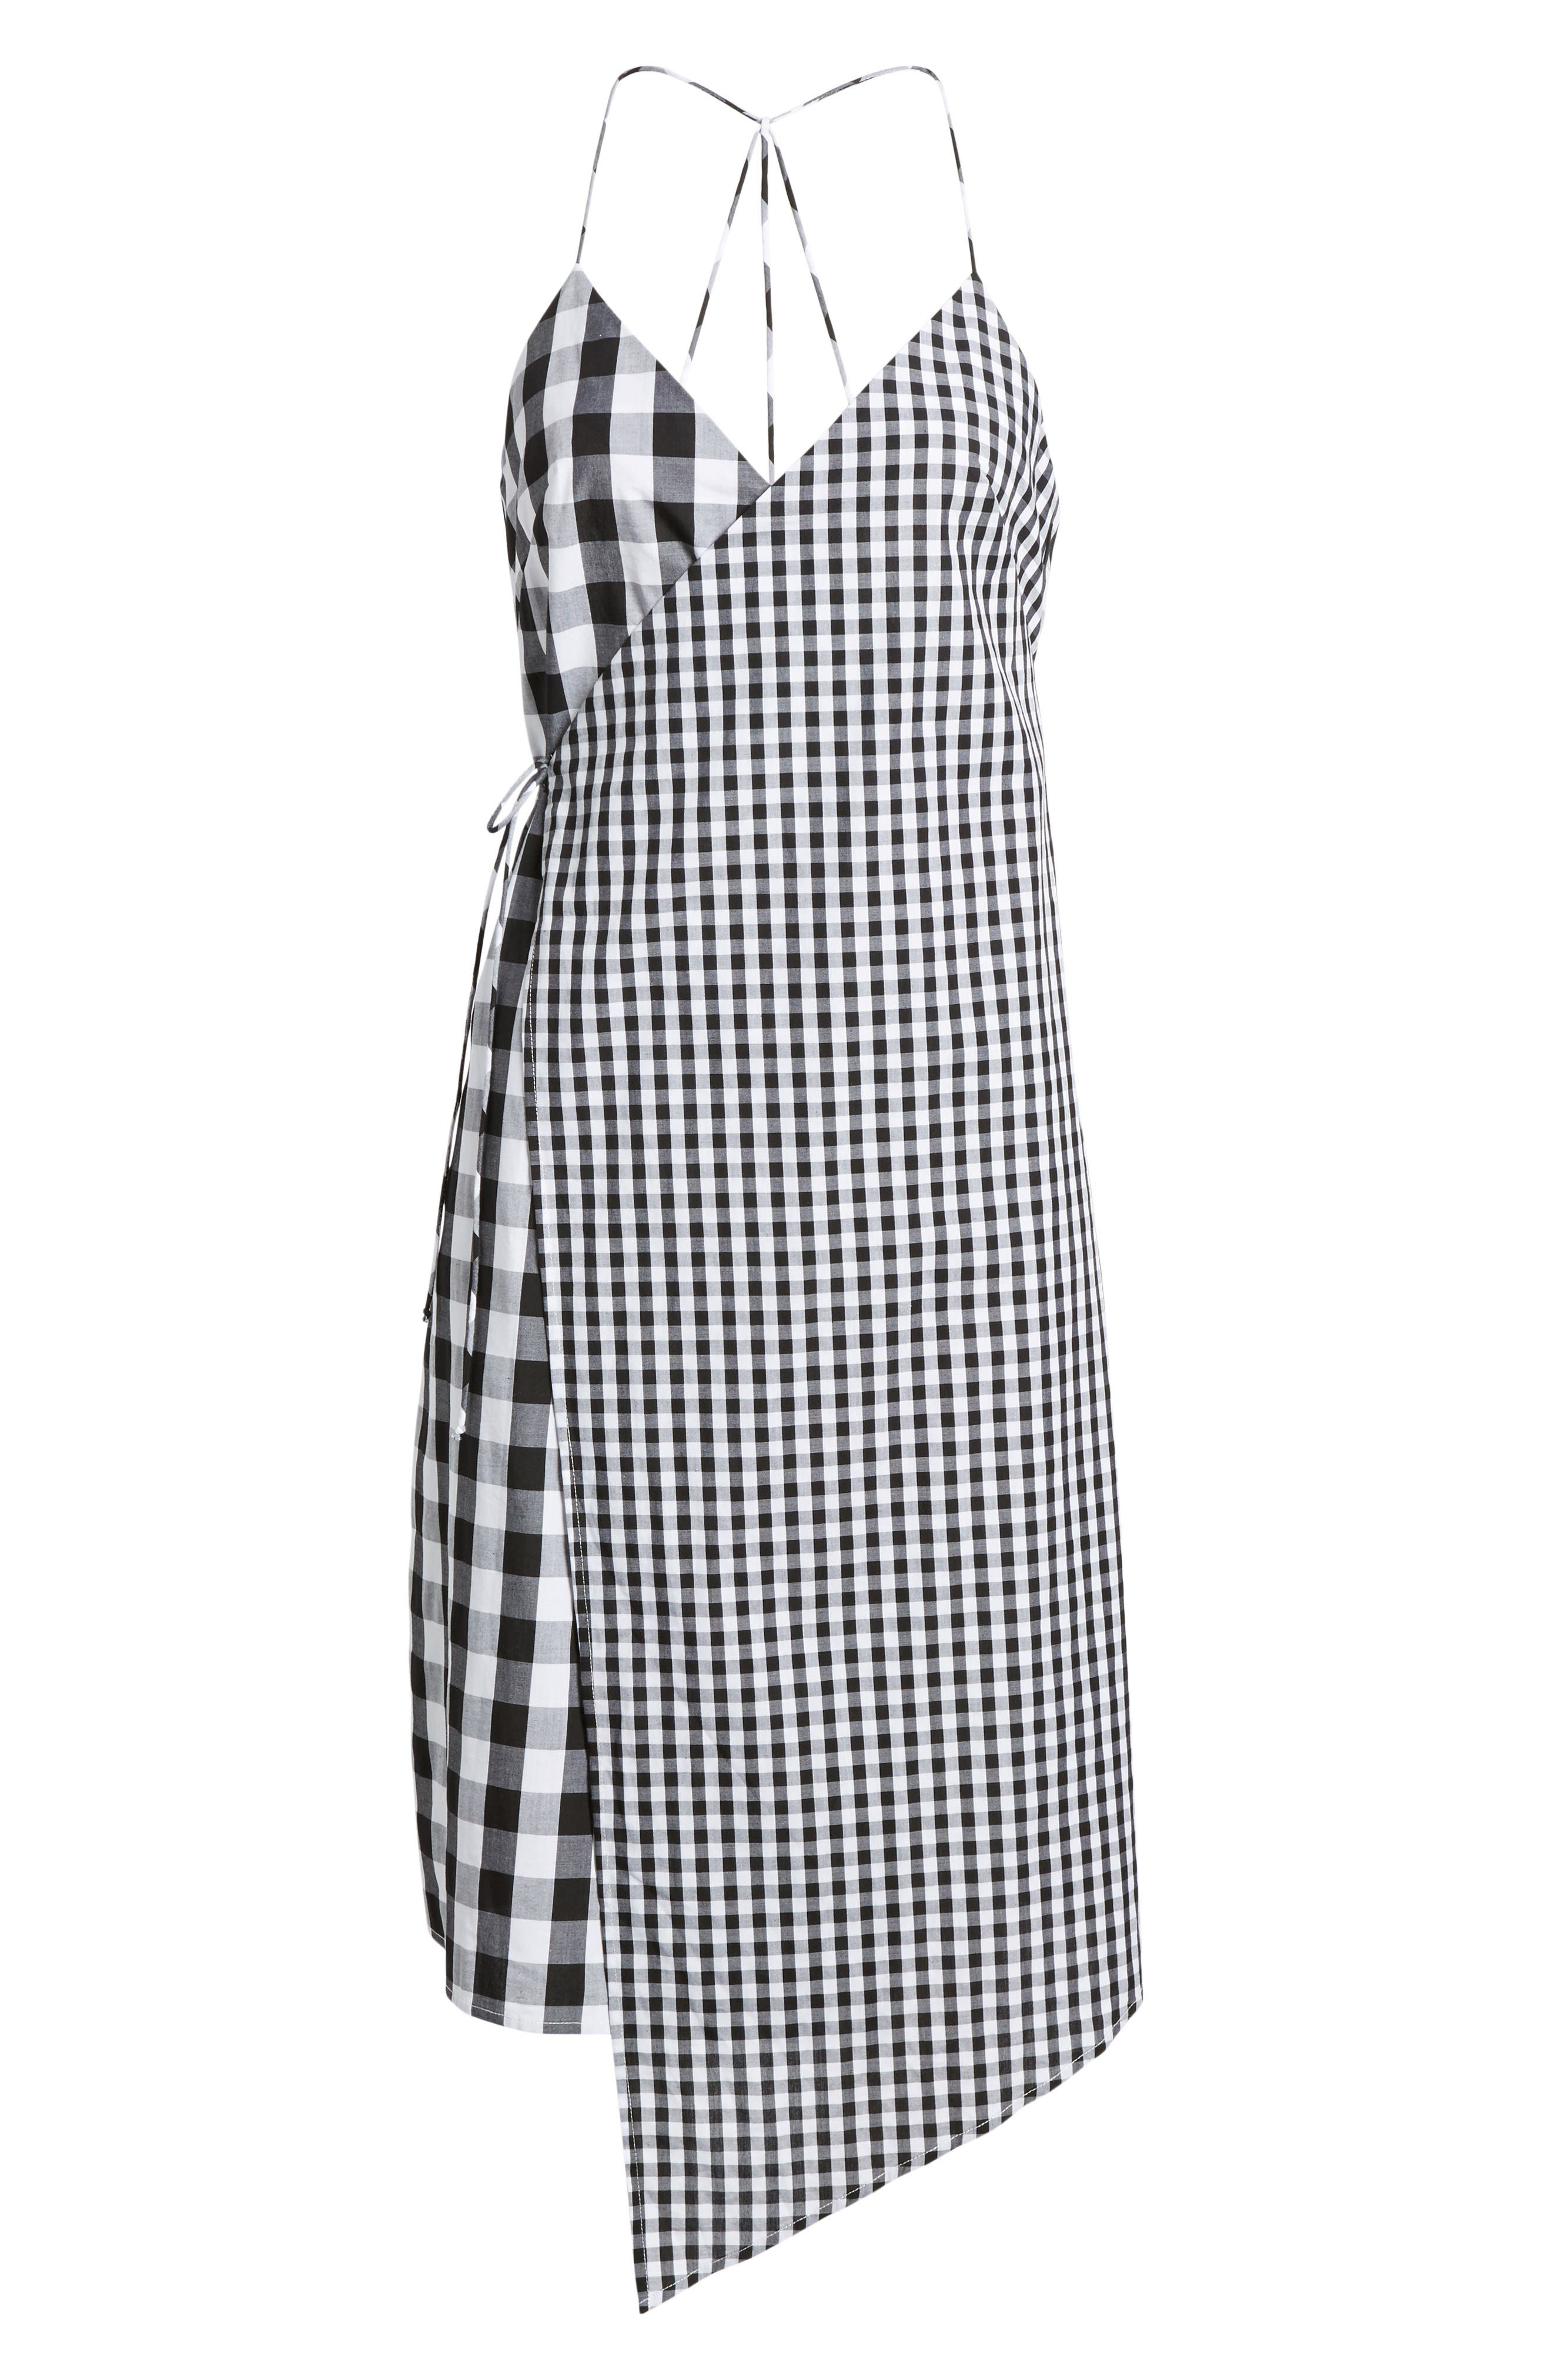 Mixed Gingham Print Wrap Dress,                             Alternate thumbnail 6, color,                             001